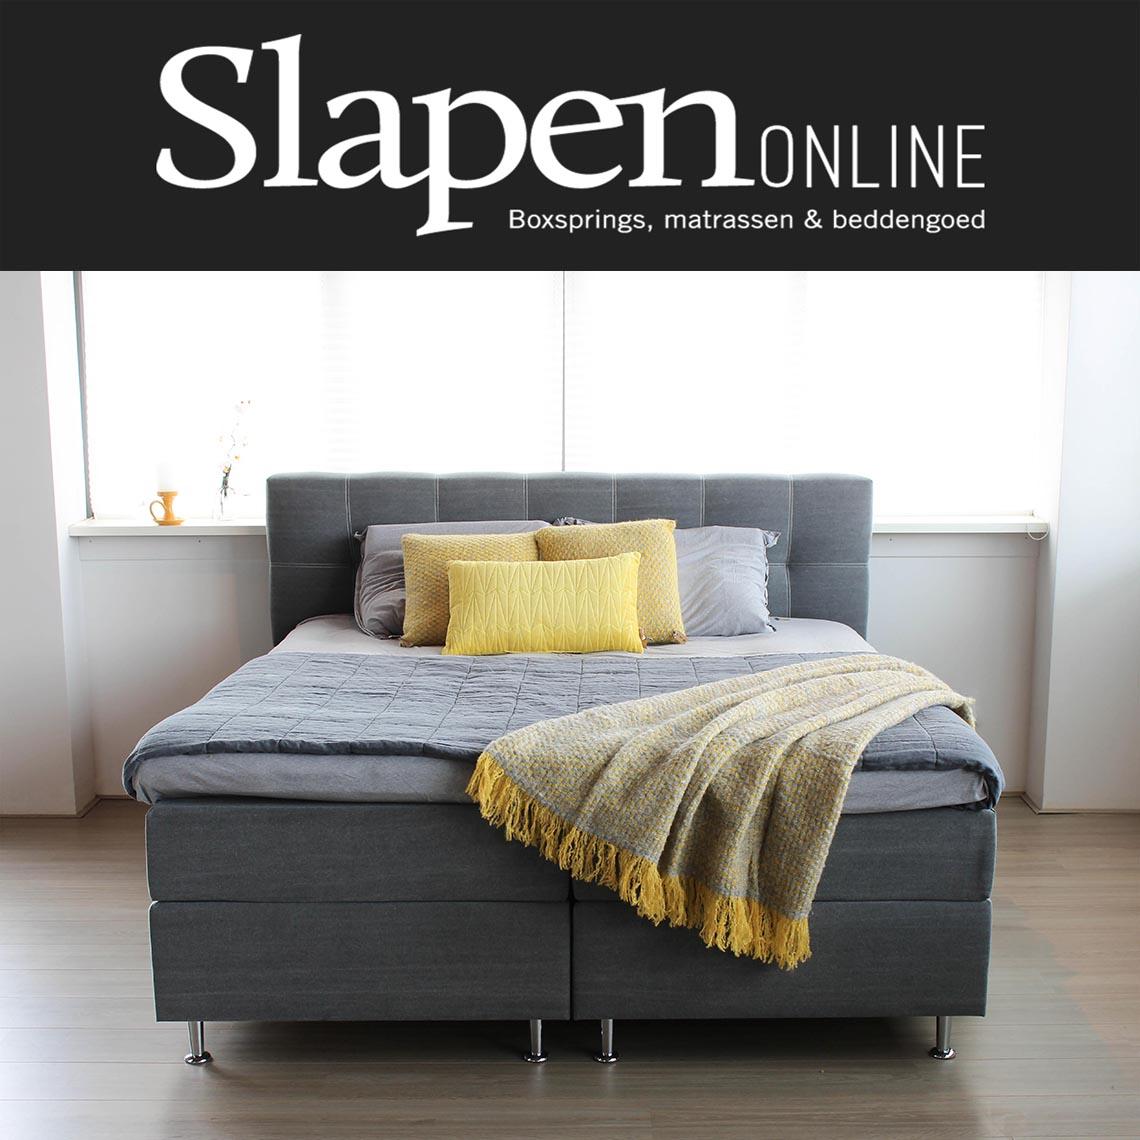 boxspring bed 160x200 bij slapen online slapen online. Black Bedroom Furniture Sets. Home Design Ideas